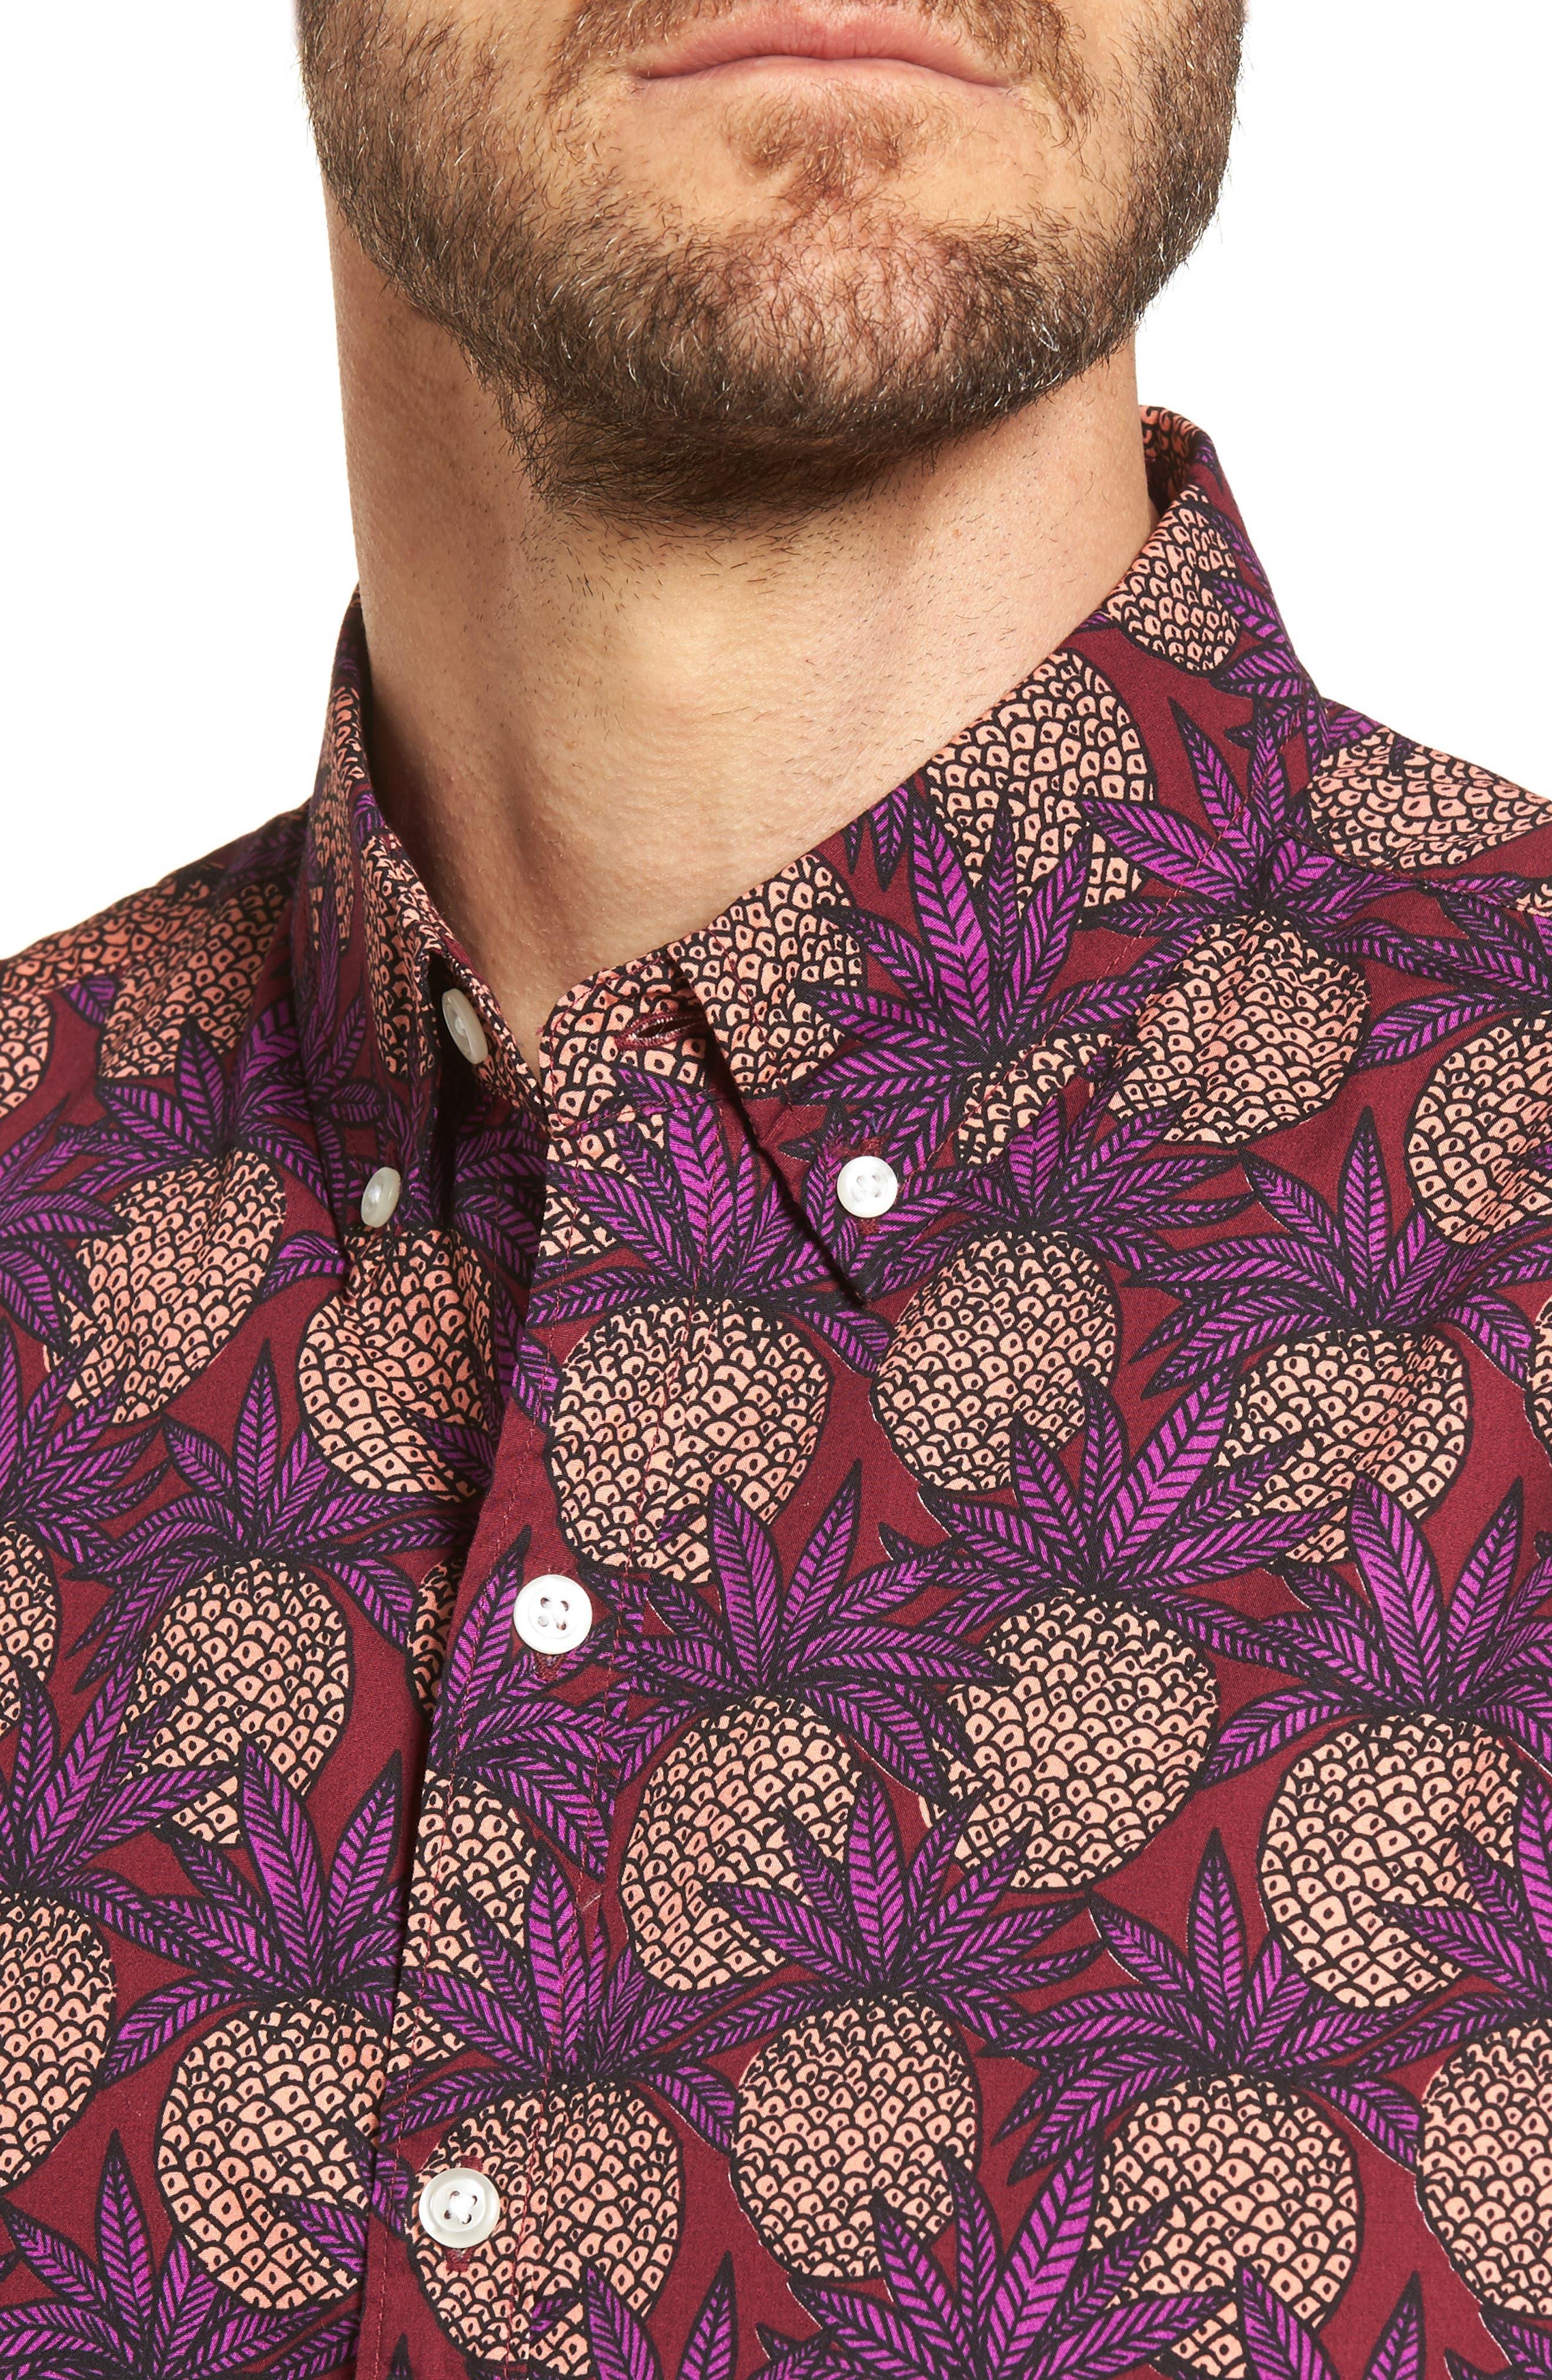 Slim Fit Pineapple Sport Shirt,                             Alternate thumbnail 4, color,                             Pineapple Fields Sangria